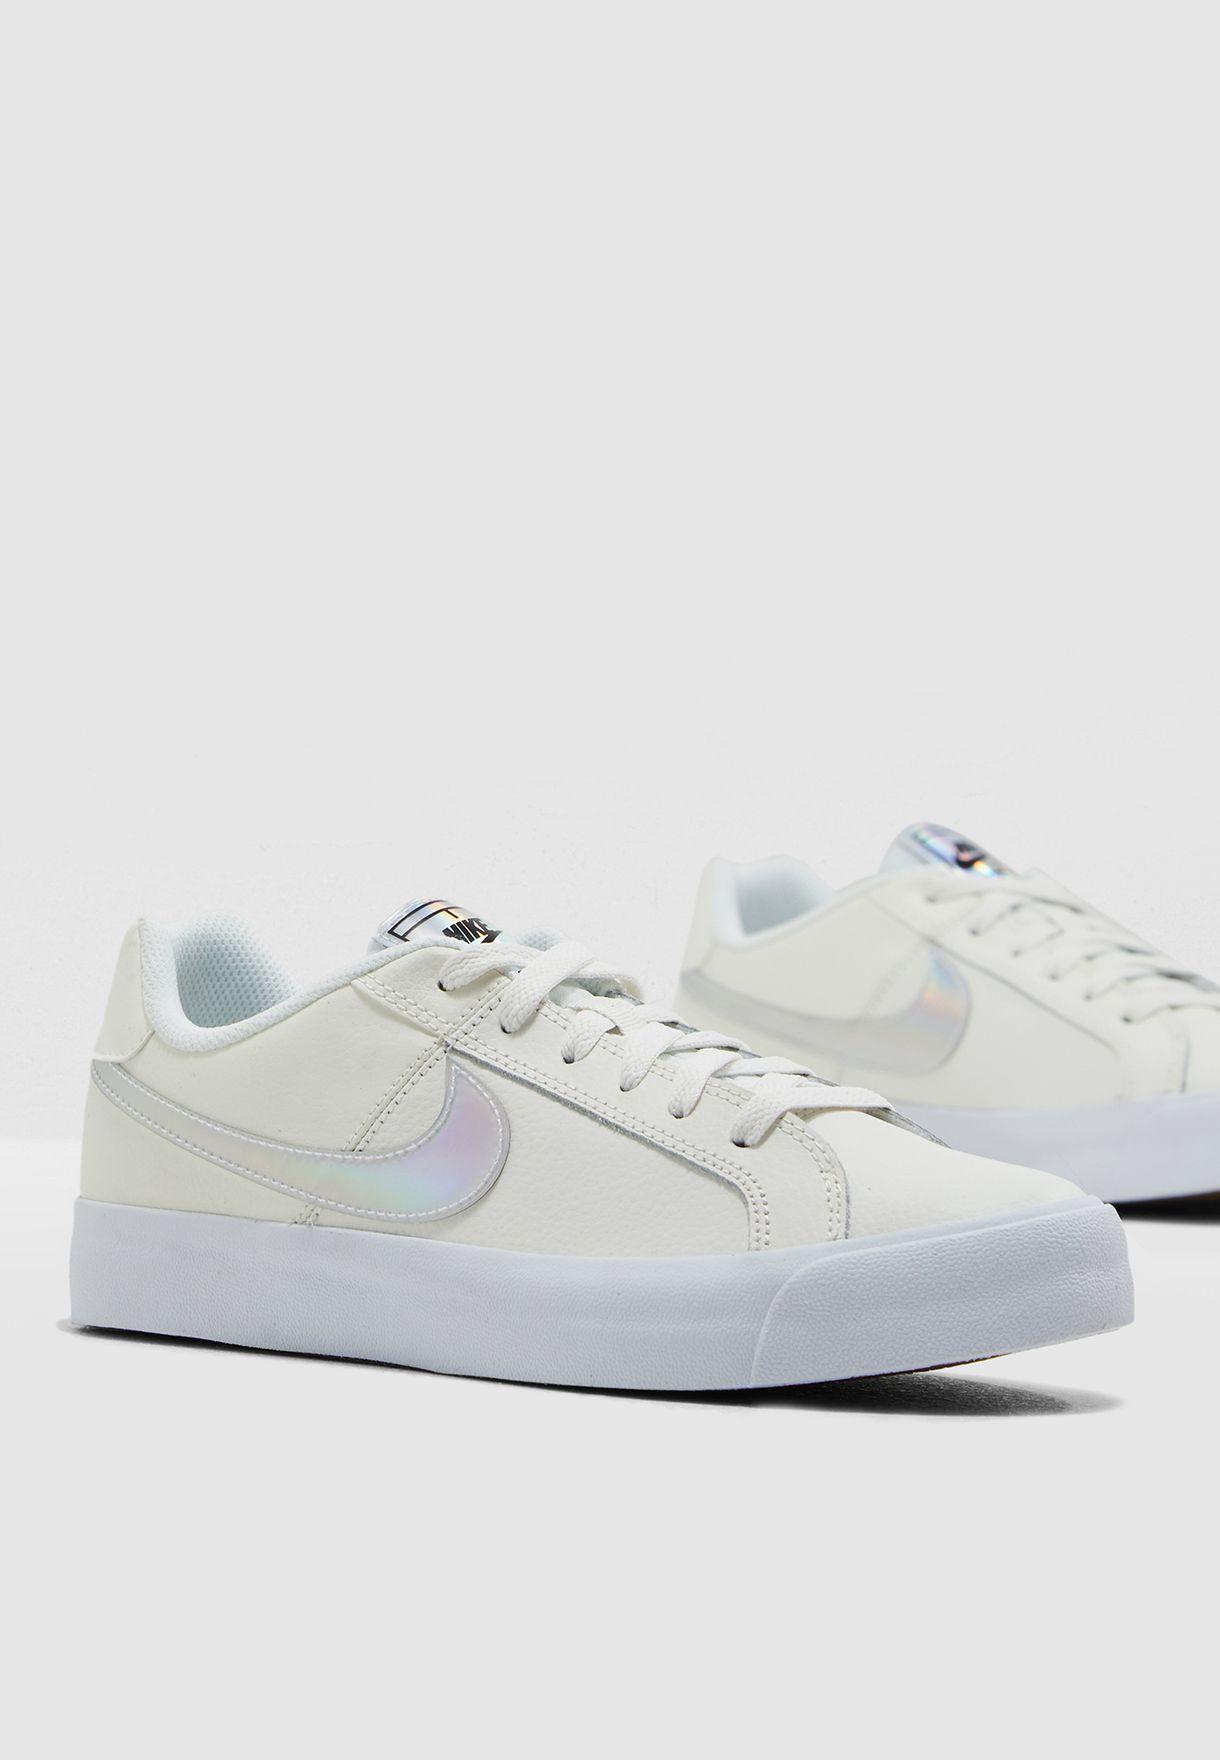 6531a71e3b7a6b Shop Nike white Court Royale AC AO2810-104 for Women in Saudi ...